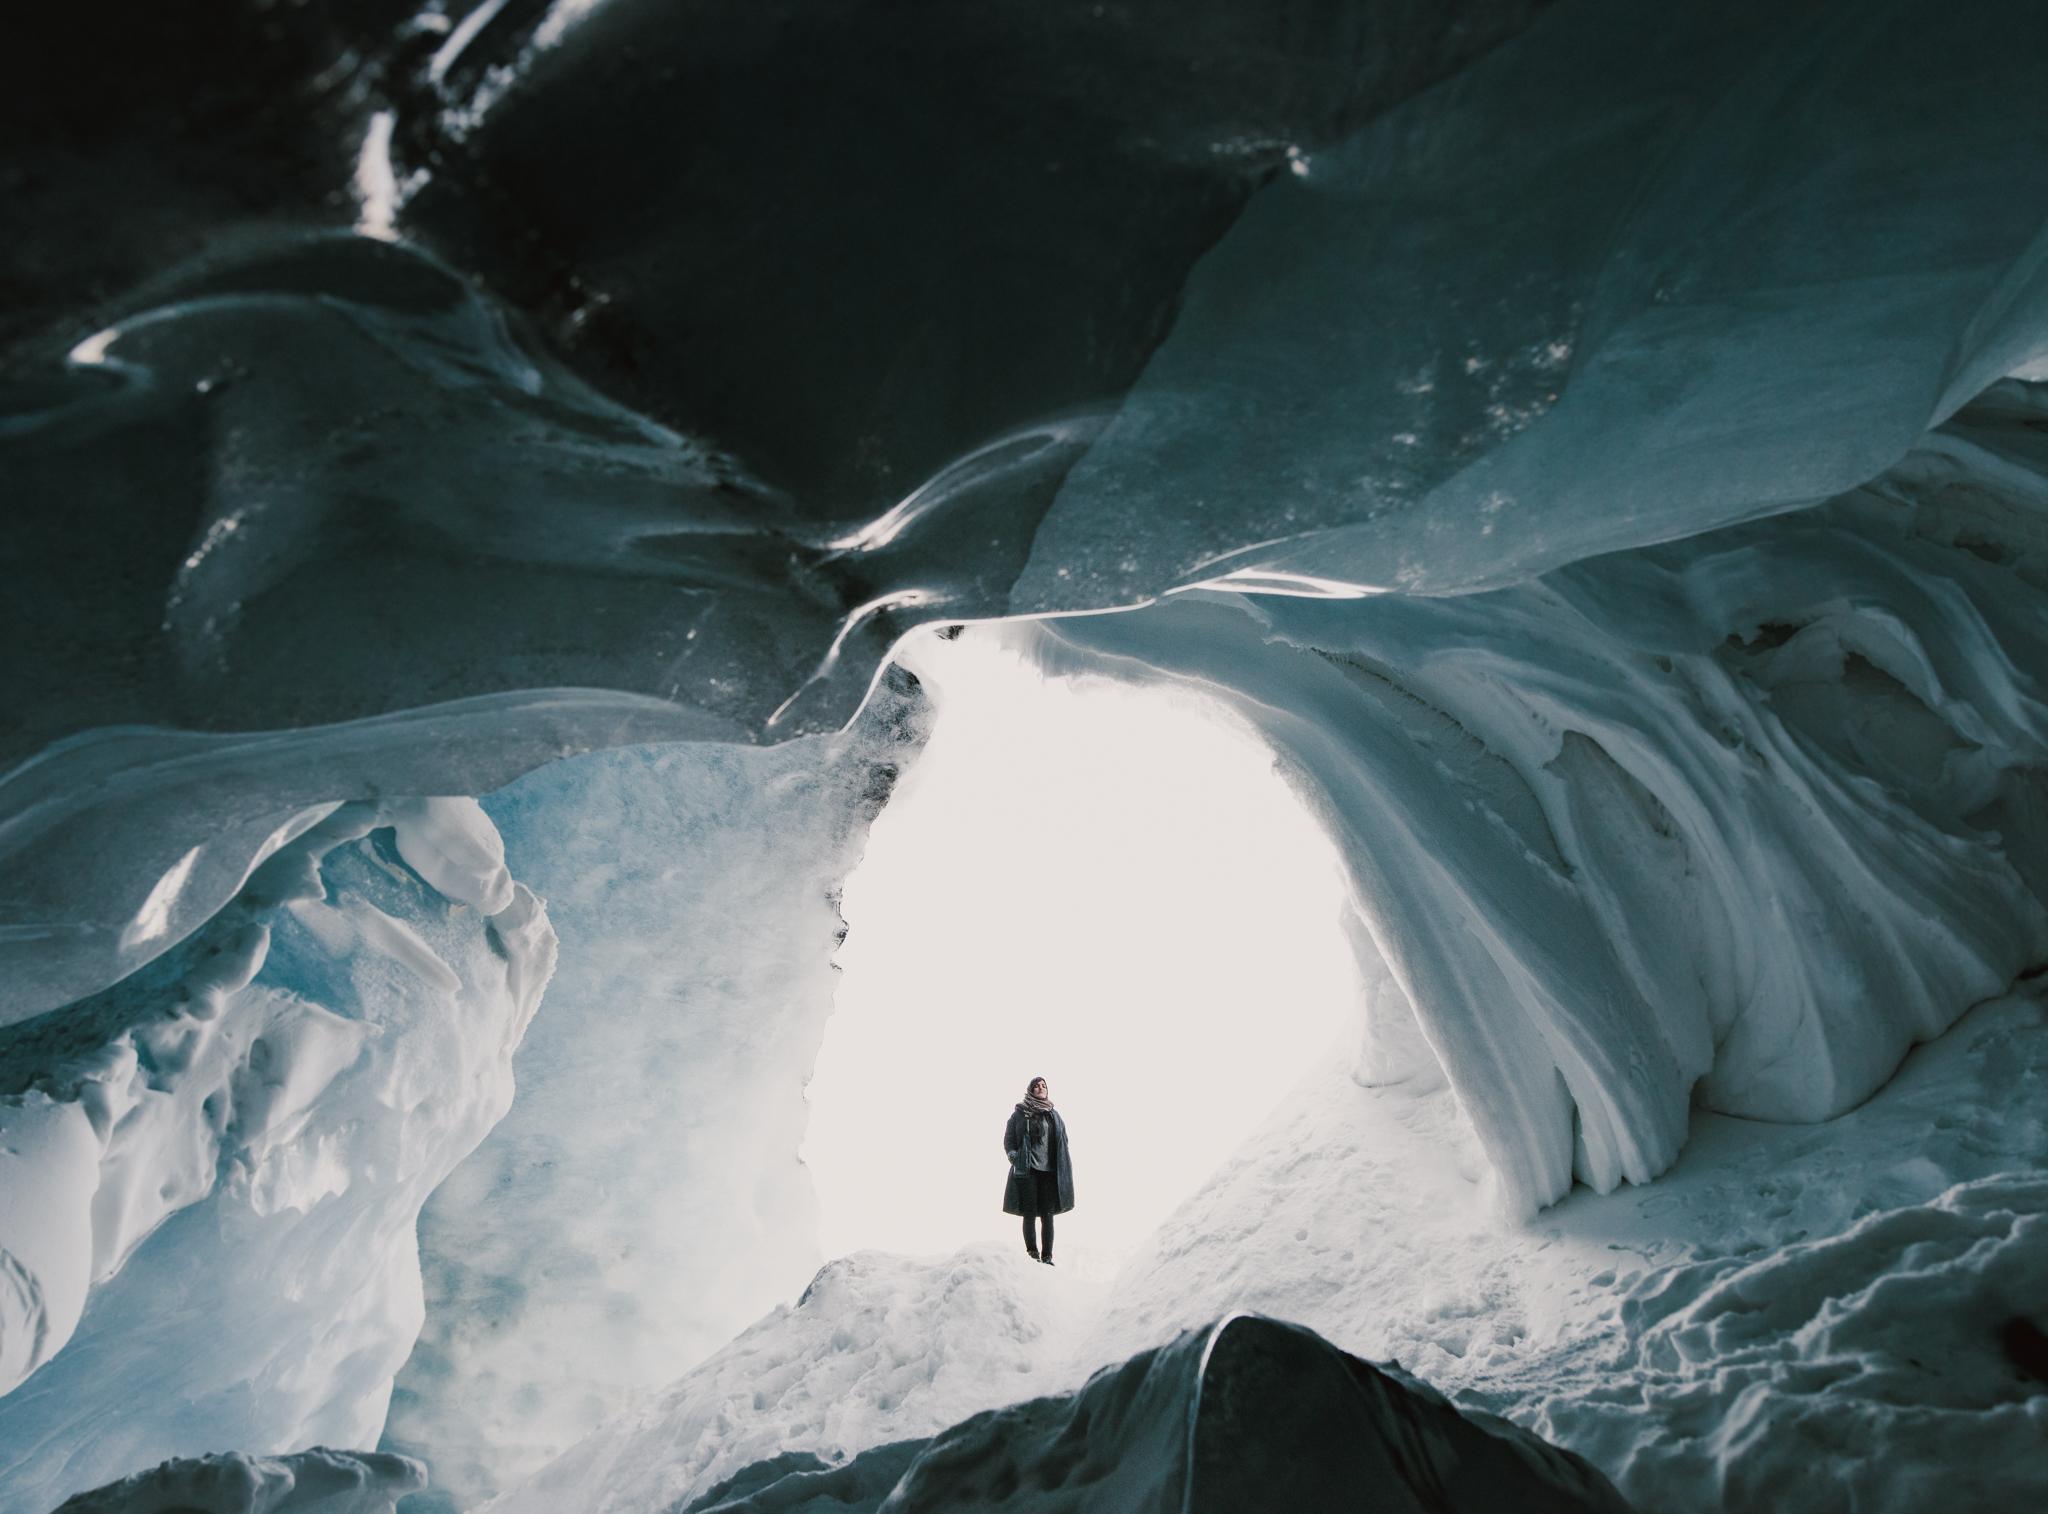 ©The-Ryans-Photo---Athabasca-Glacier,-Ice-Cave-052.jpg